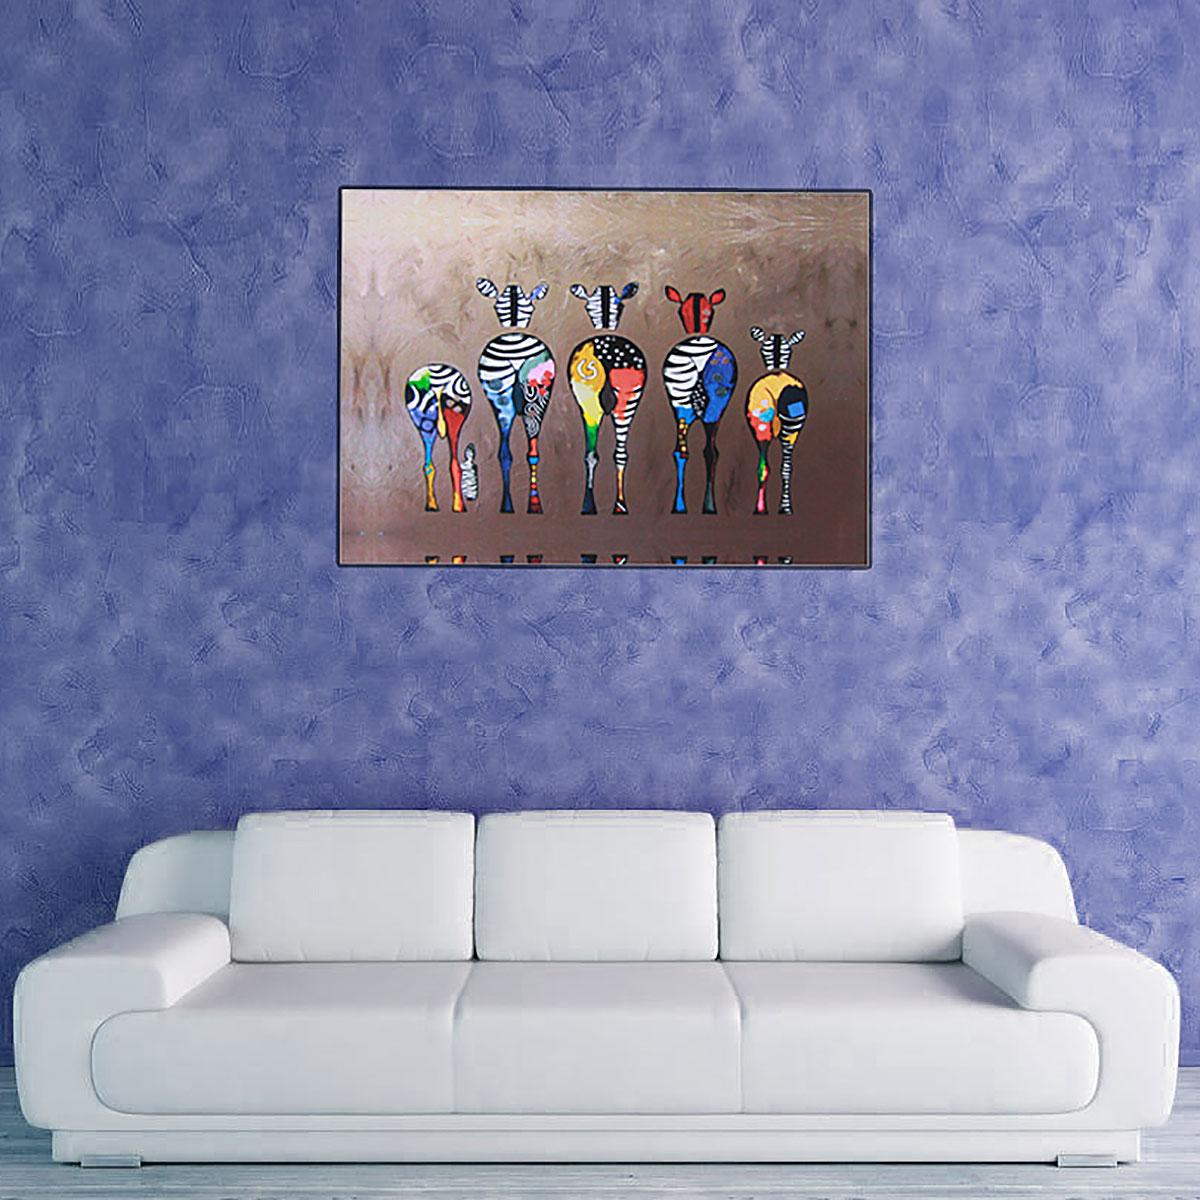 Hd unframed canvas print zebra home decor wall art poster for Zebra home decorations